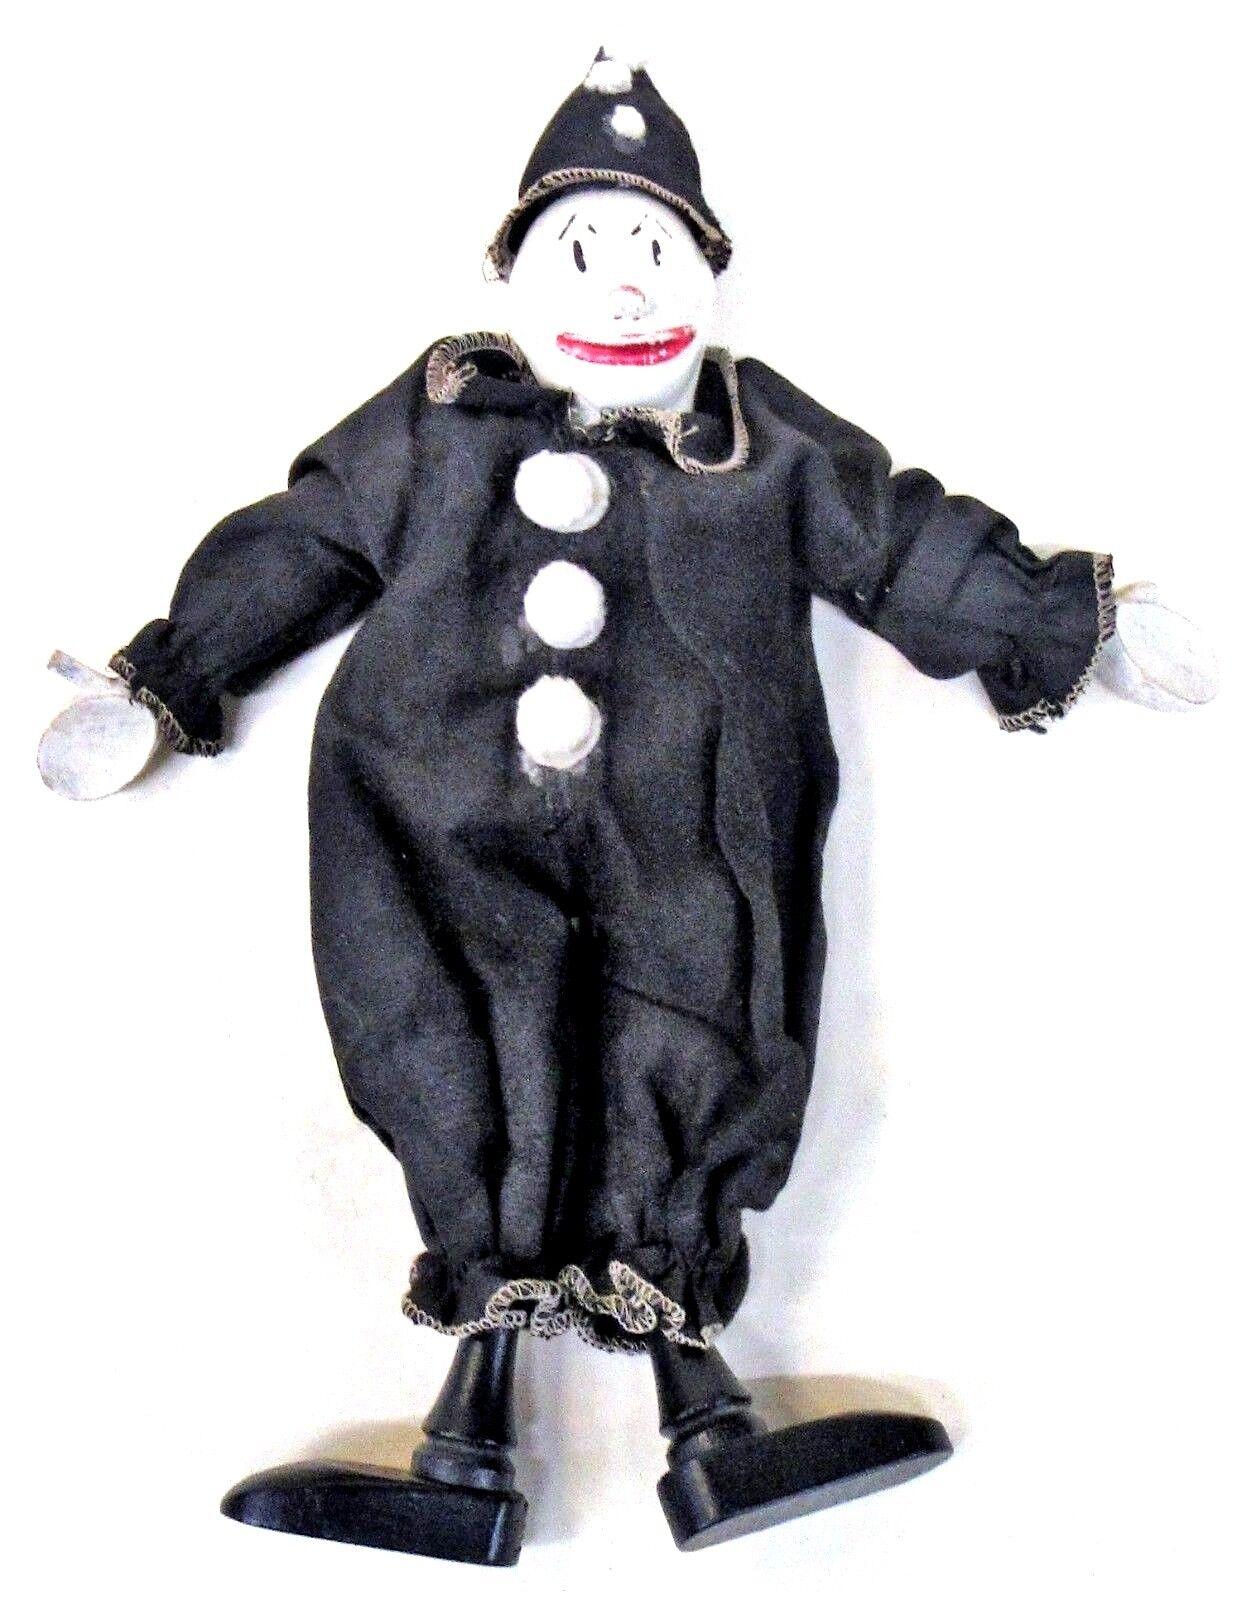 Ultra rare Schoenhut KOKO KOKO KOKO THE CLOWN Max Fleisher Out of The Inkwell cartoon doll 451618